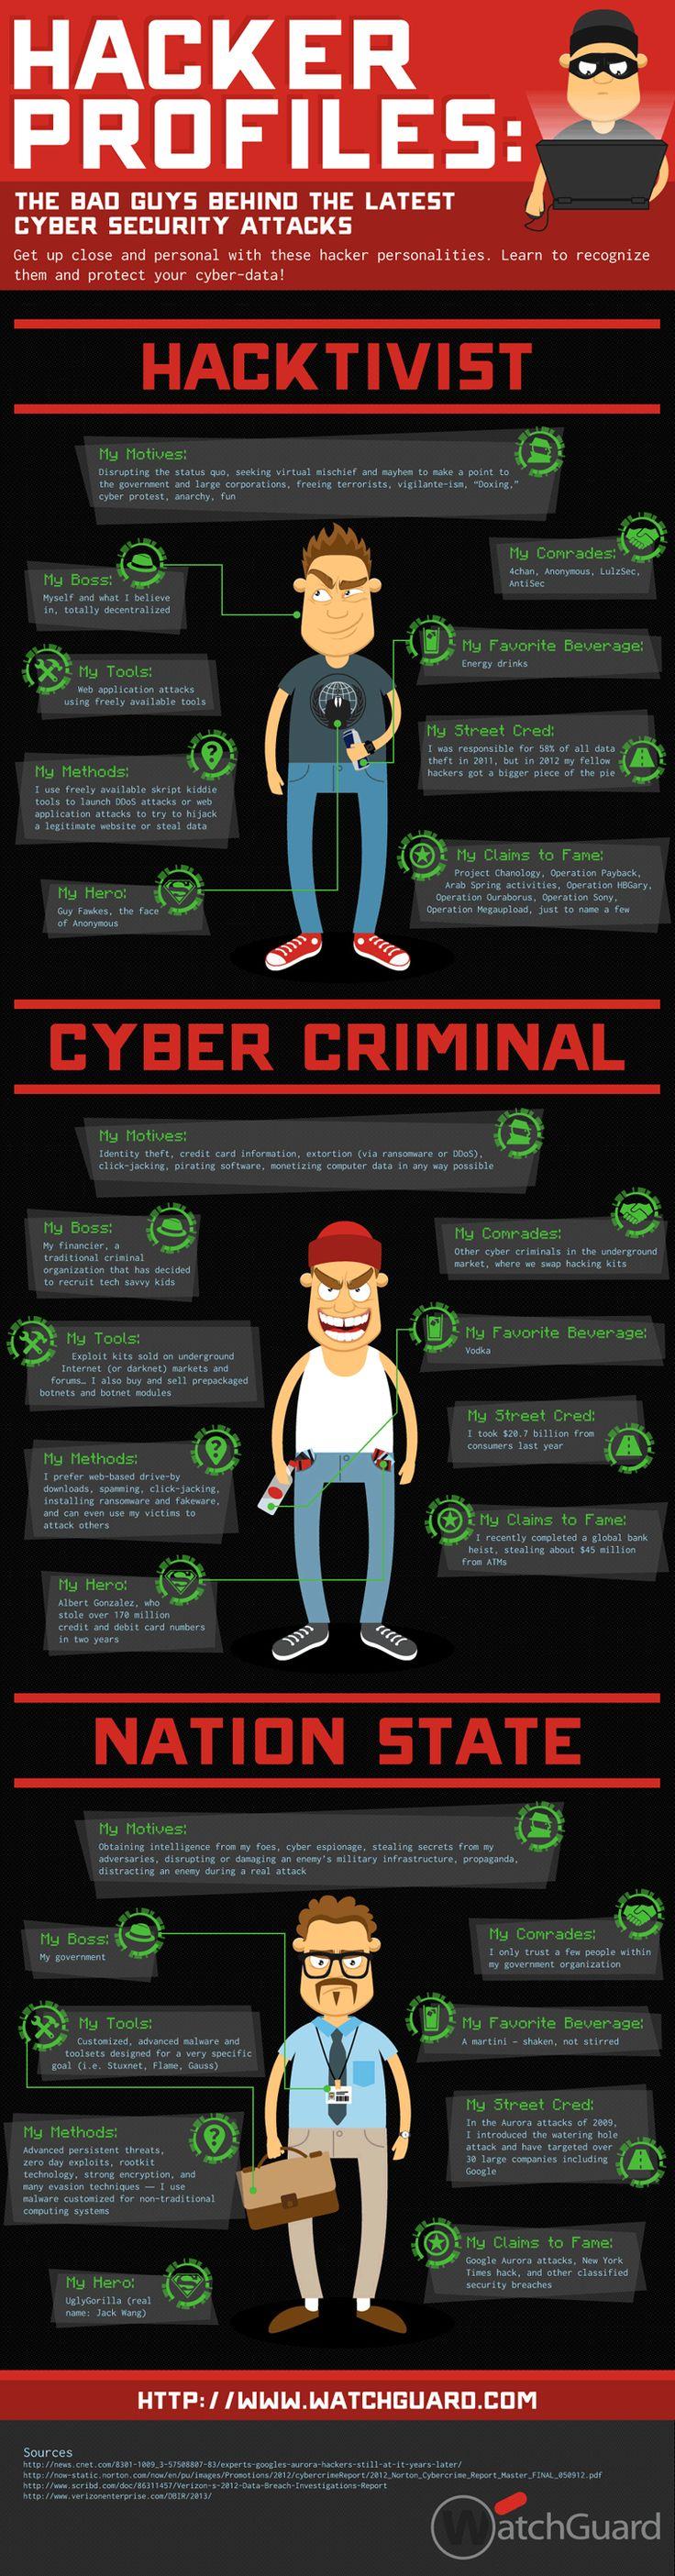 Hacker Profiles